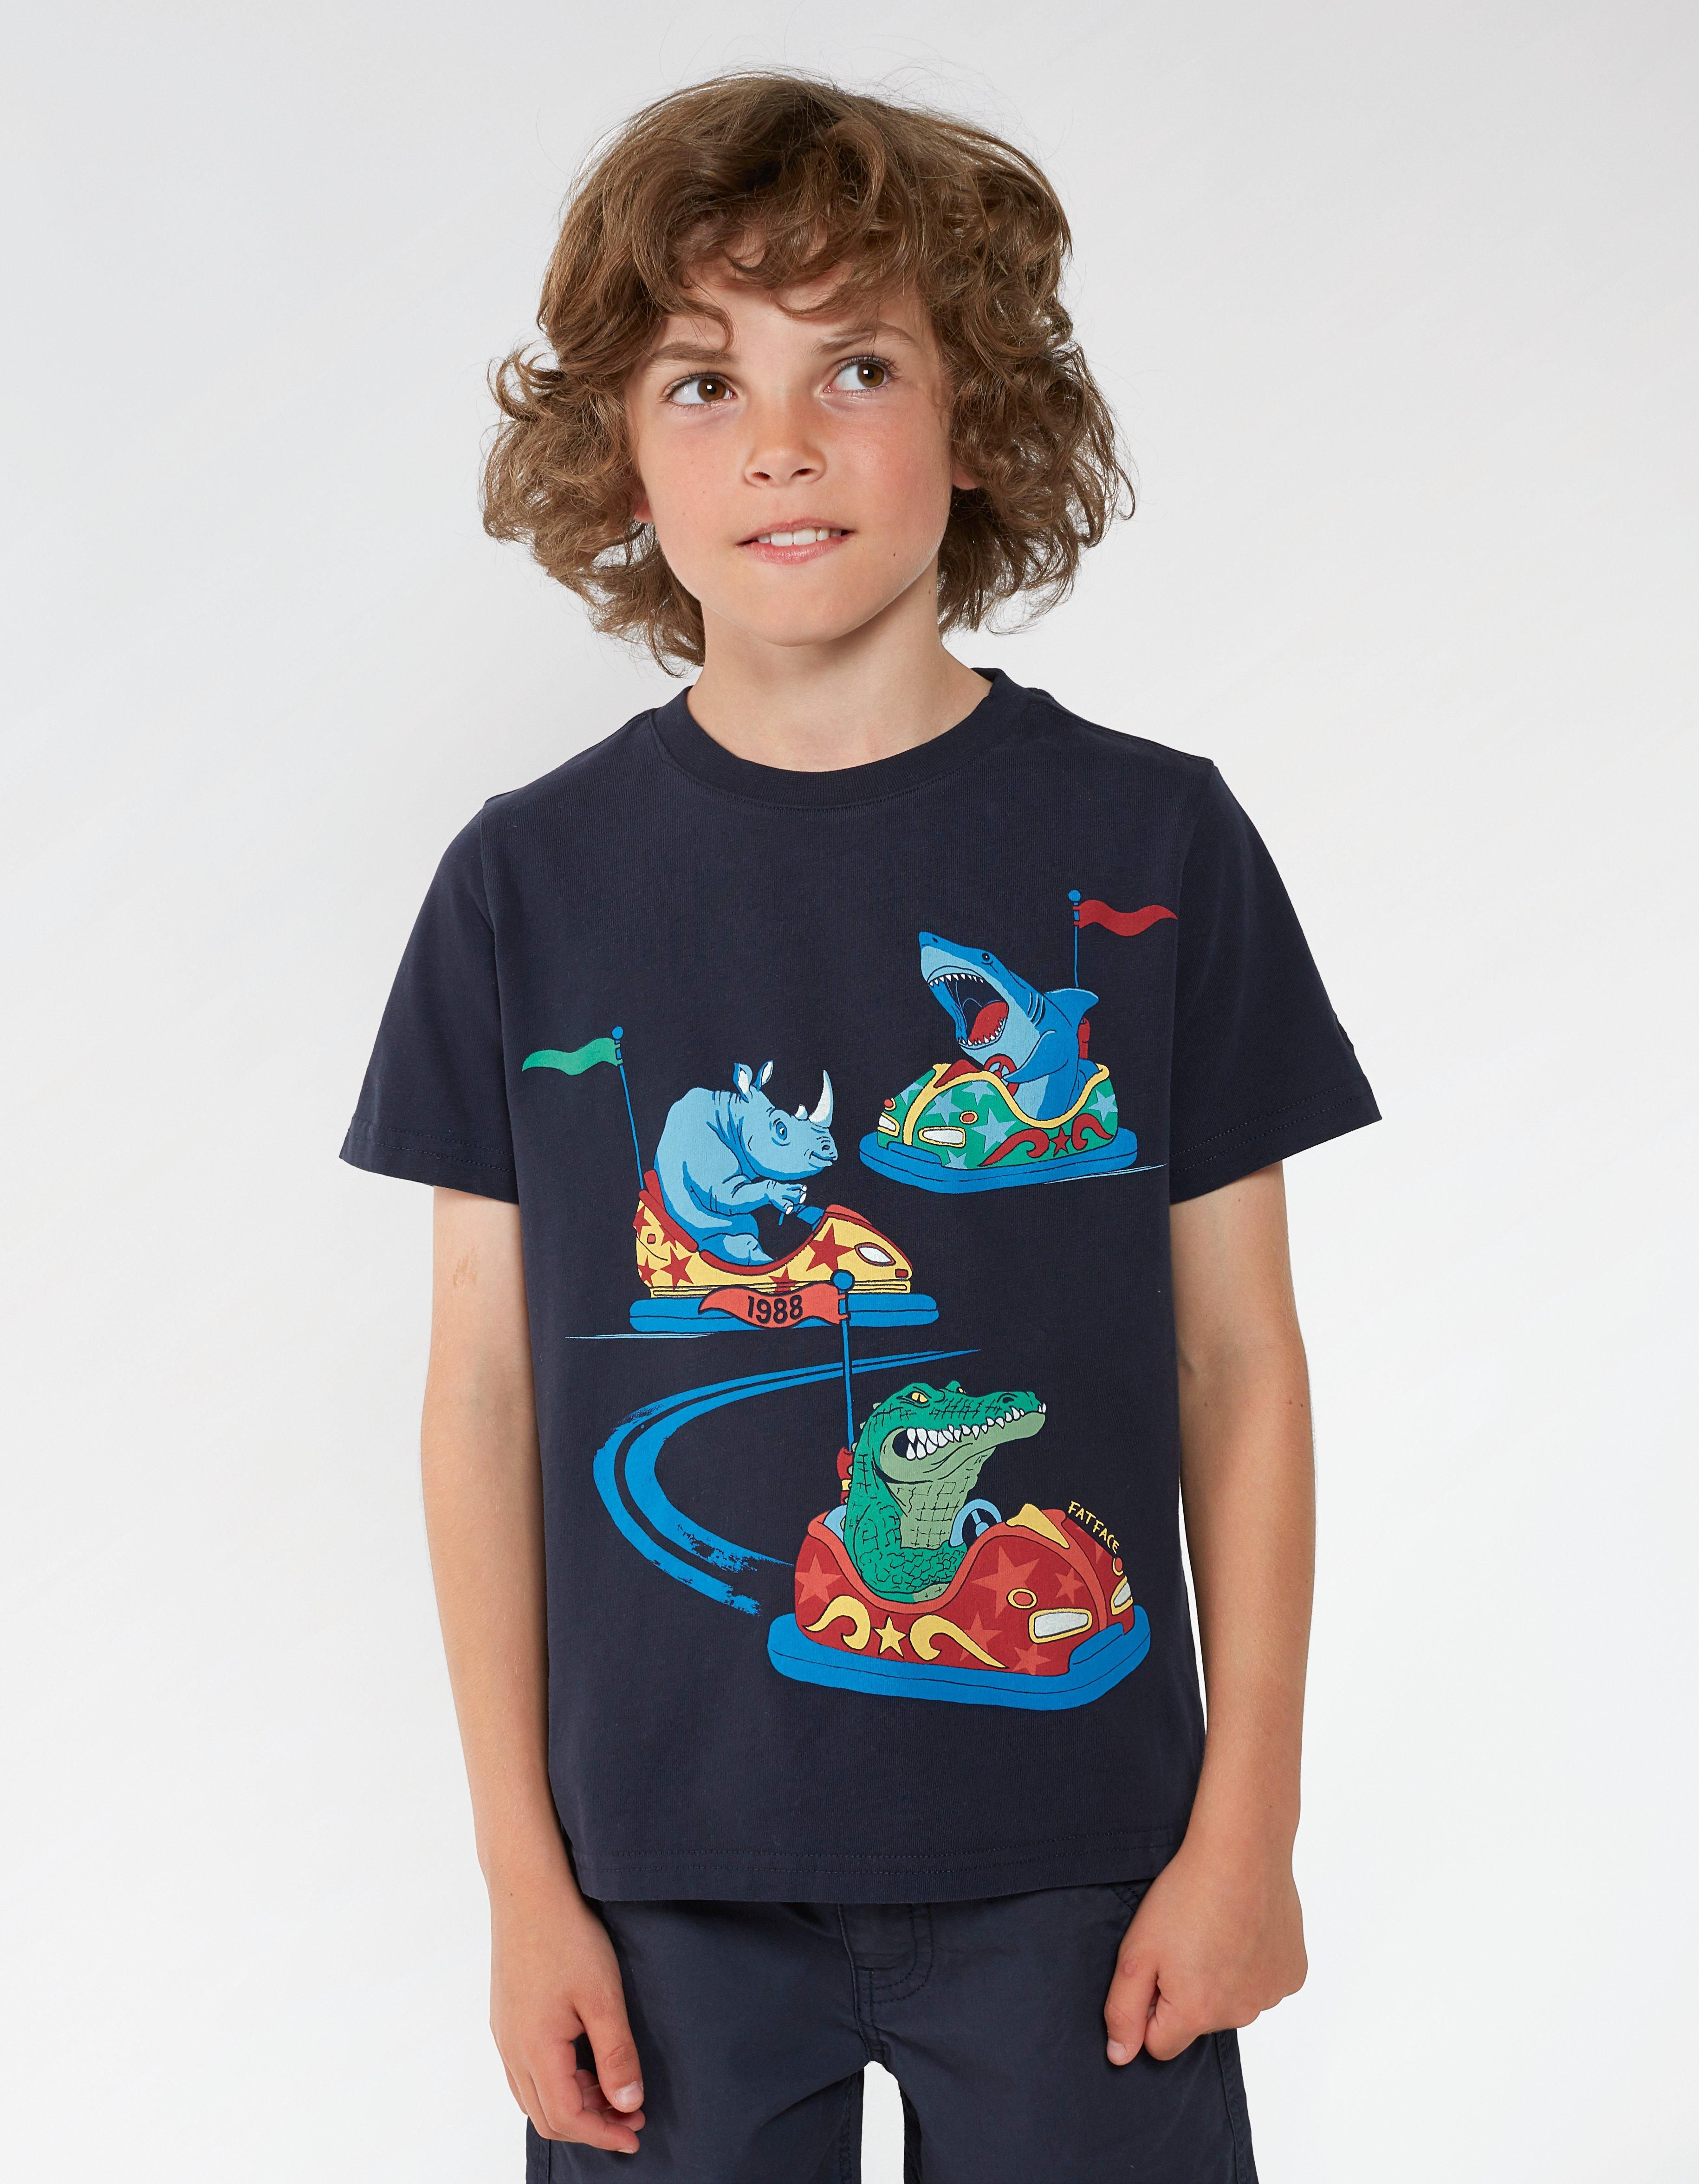 Per Car Creature Graphic T Shirt Boy Outfits Boys